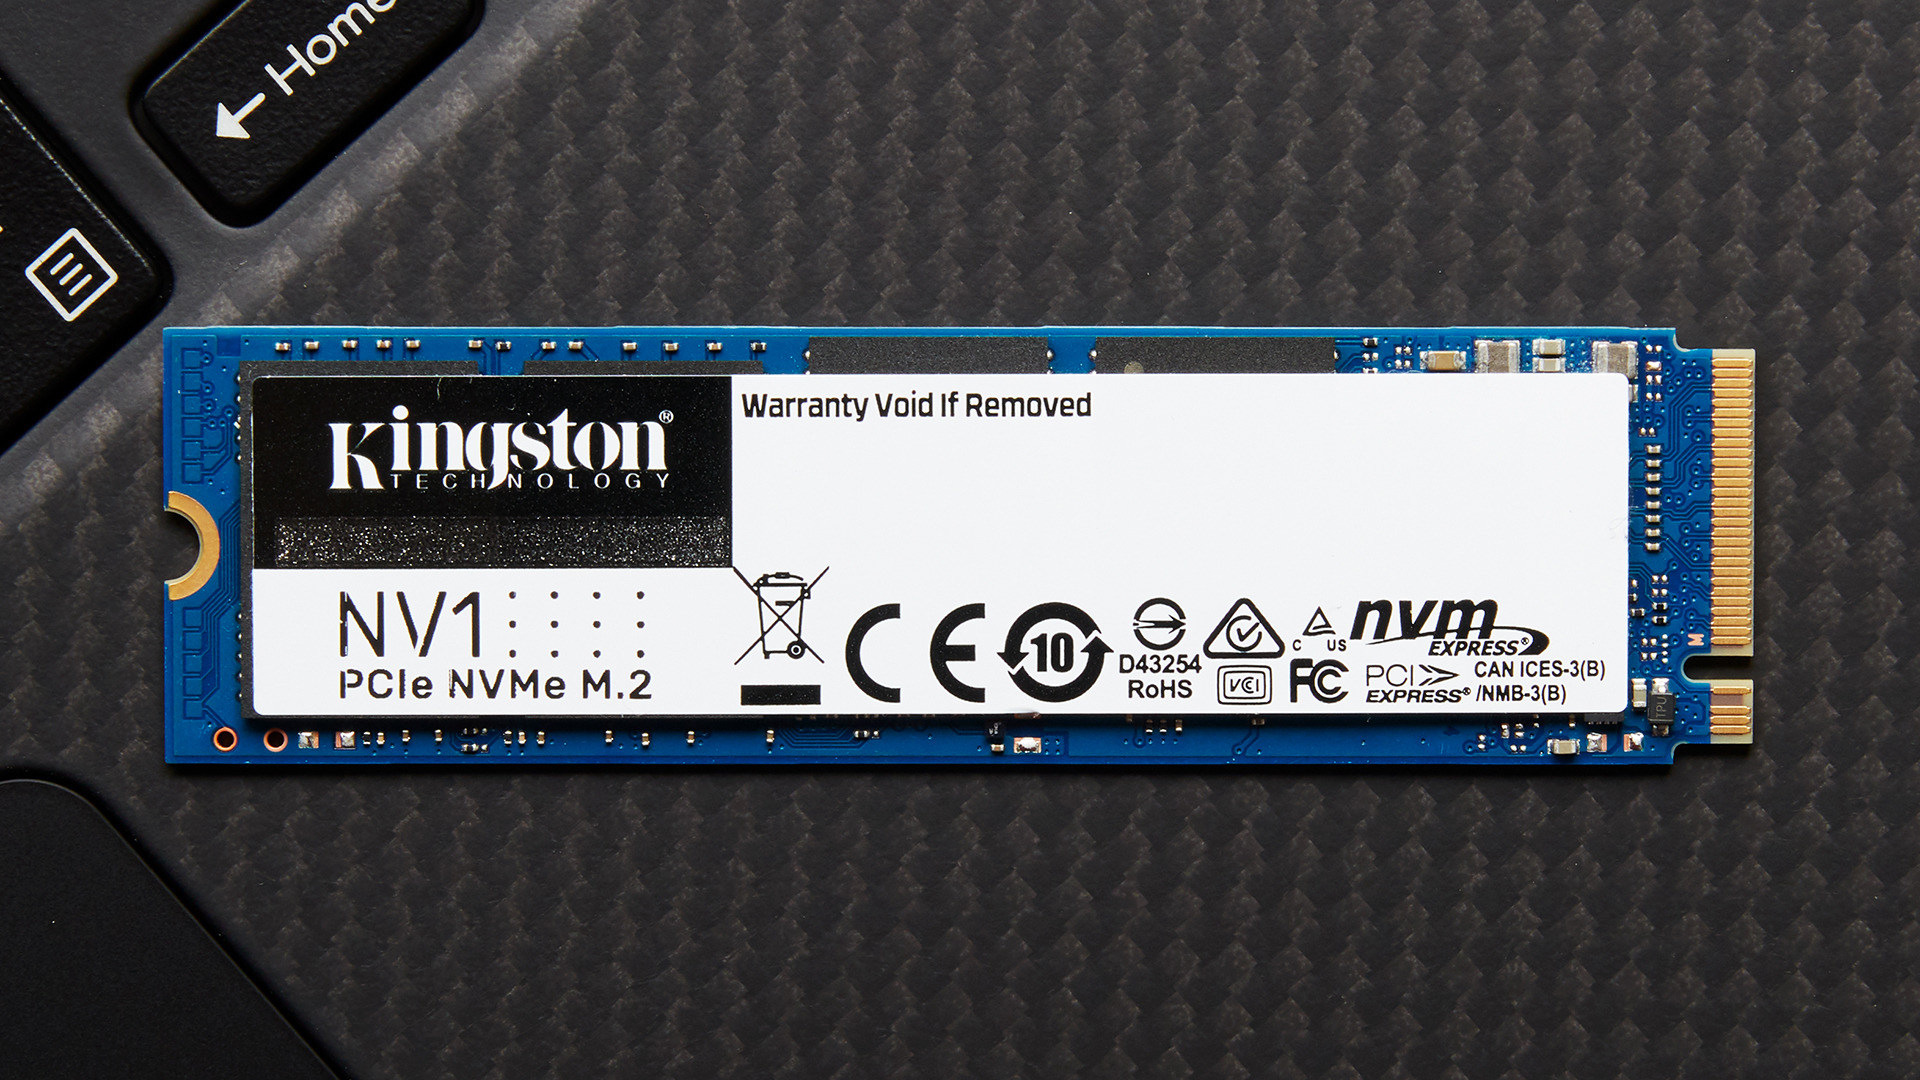 Ssd, M.2, NVMe, Kingston, Solid State Drives, PCIe 3.0 x4, Kingston NV1, NV1